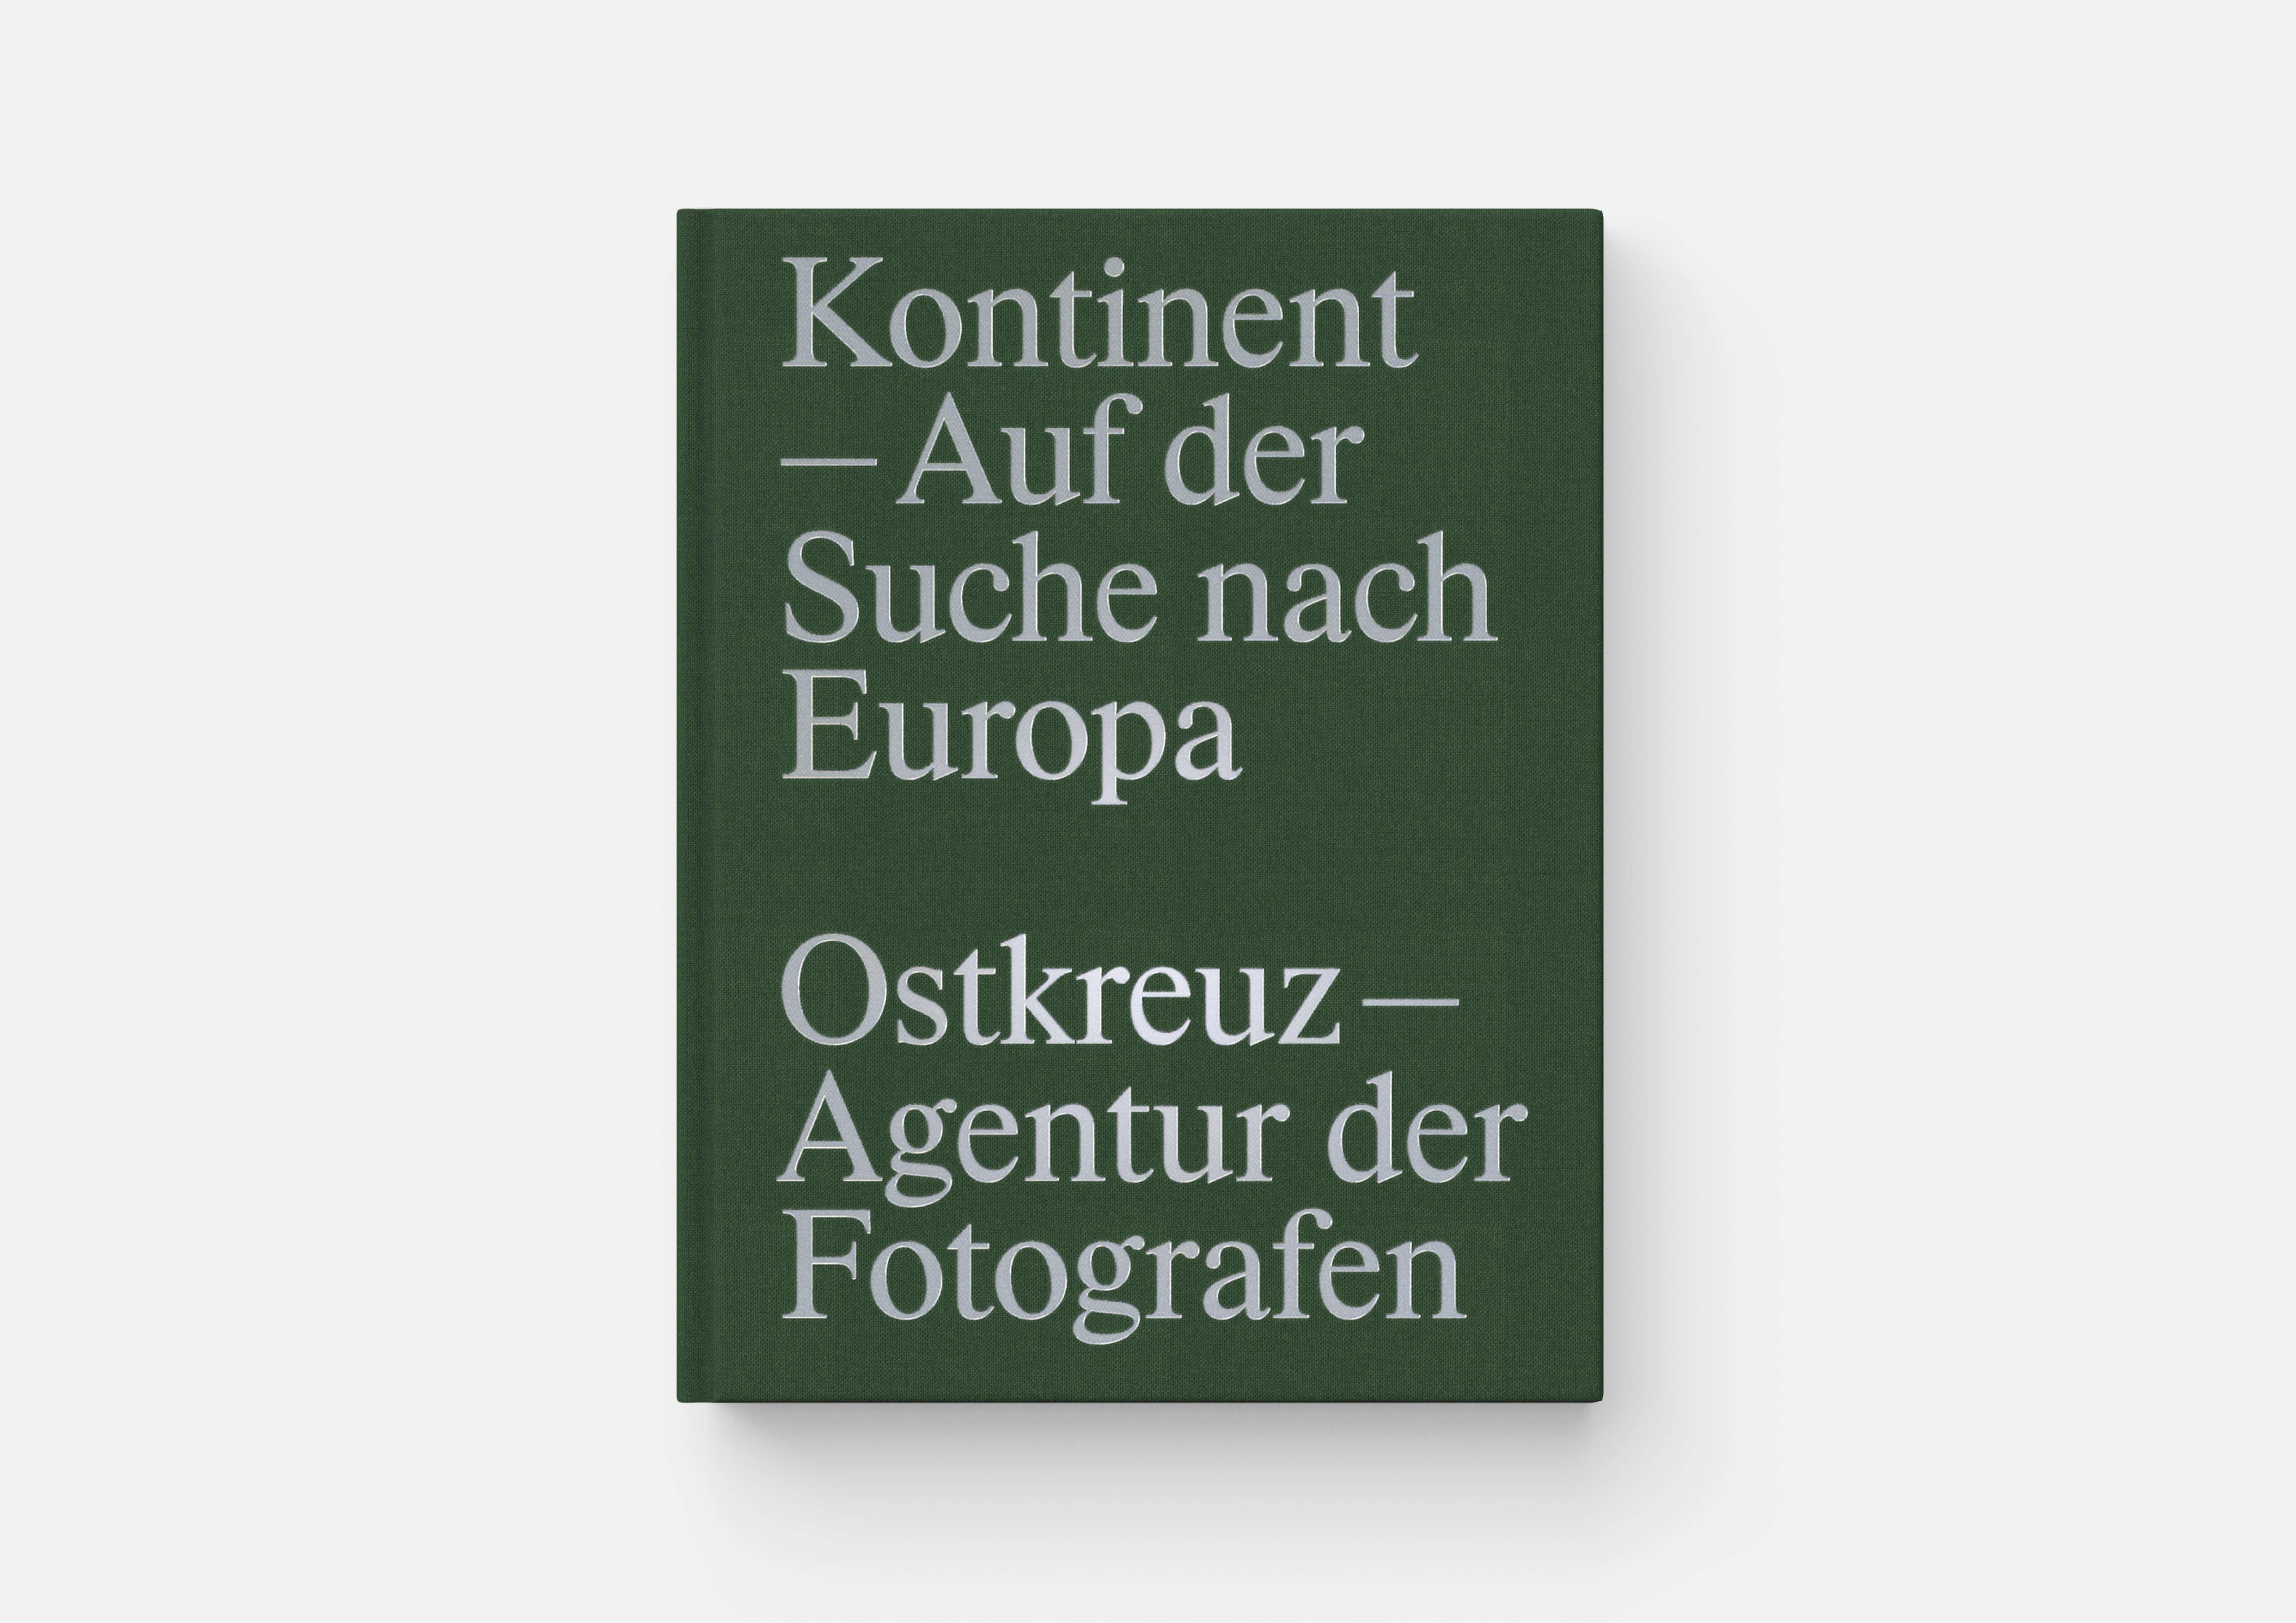 https://neuegestaltung.de/media/pages/clients/ostkreuz-kontinent/4d9531d938-1606670610/1_ostkreuz-kont-cover-front.jpg